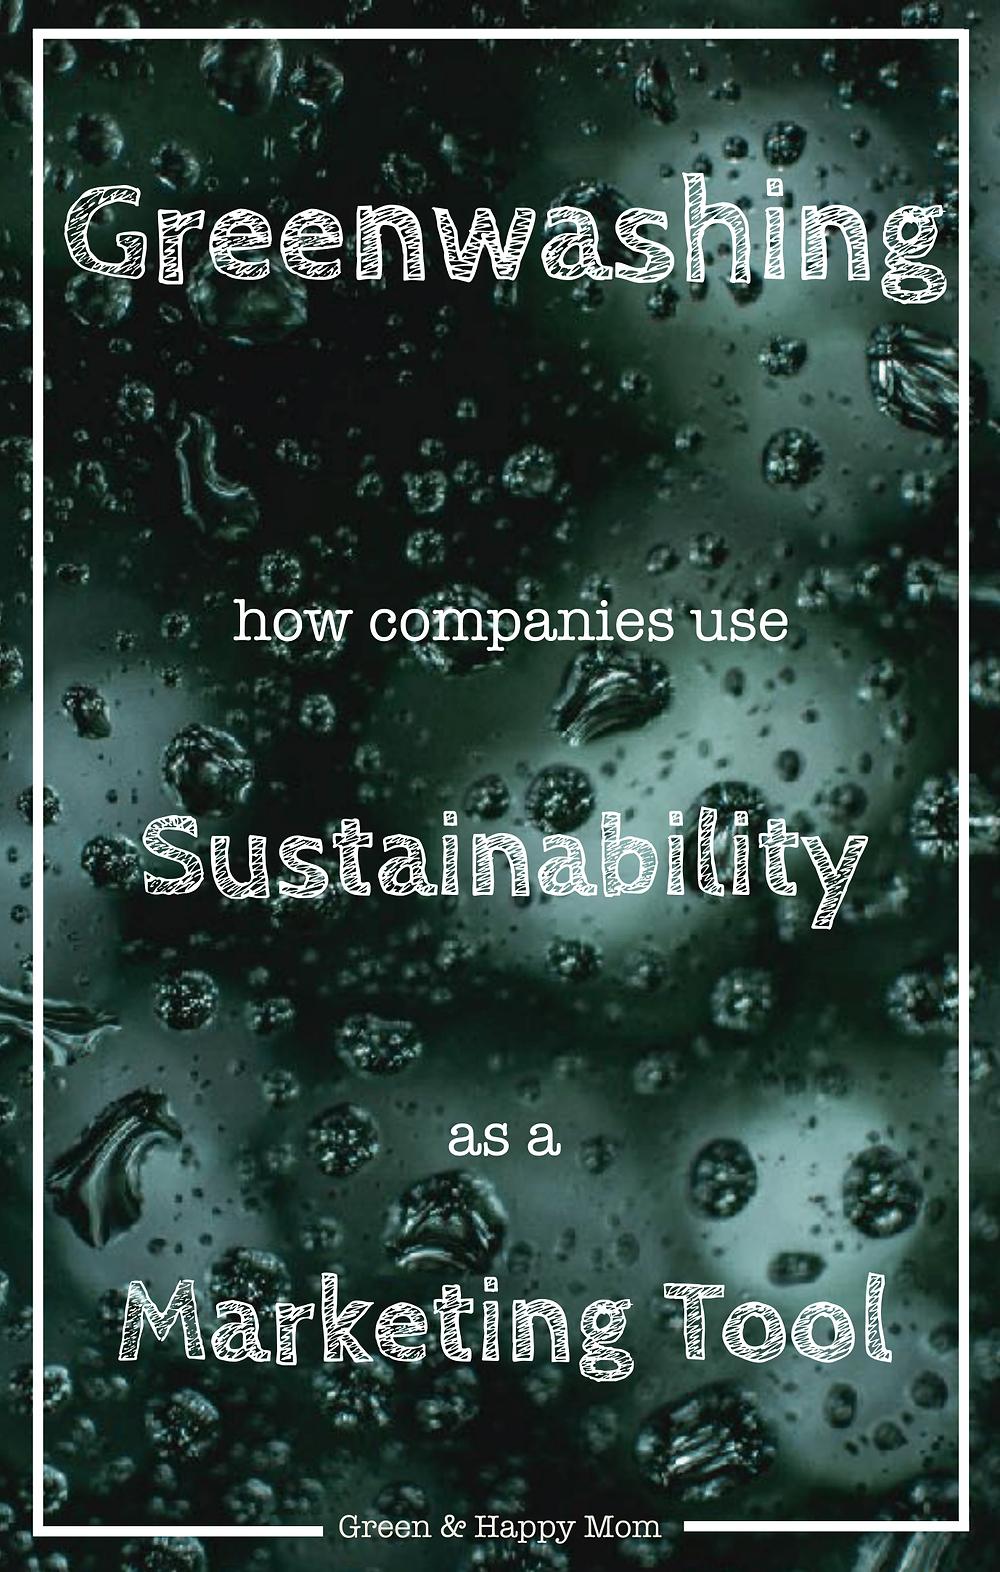 Greenwashing as a marketing tool